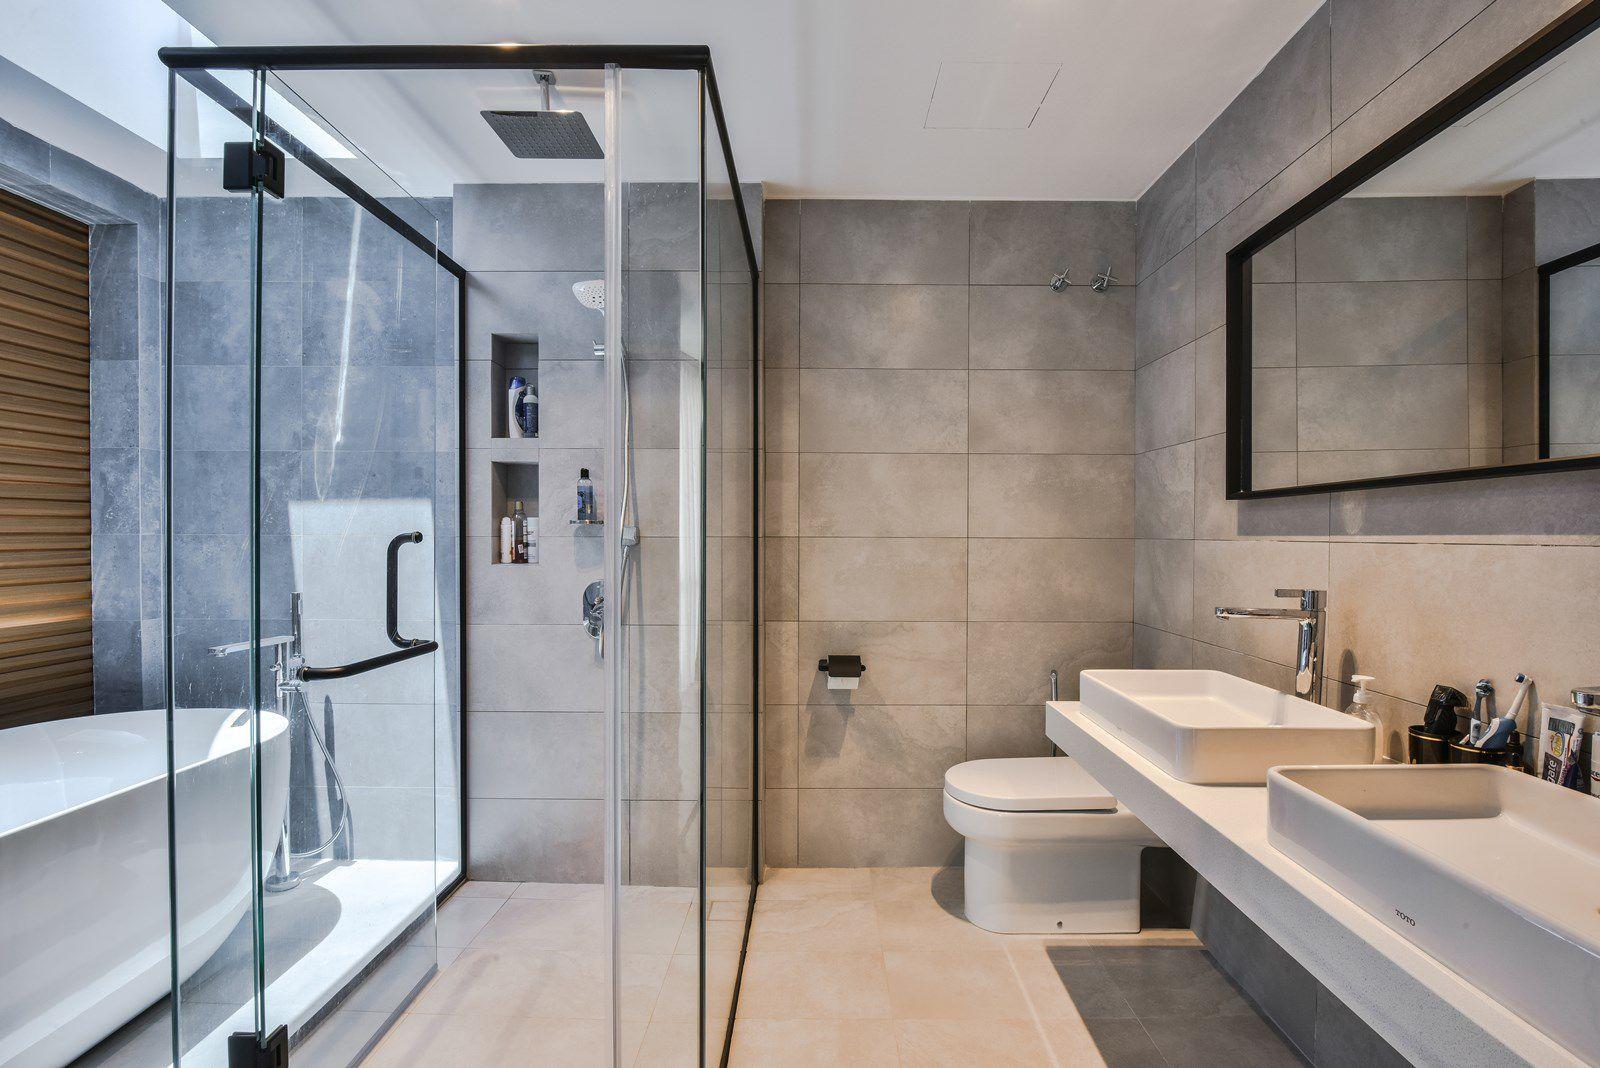 Open skylights window in a Scandinavian designed bathroom